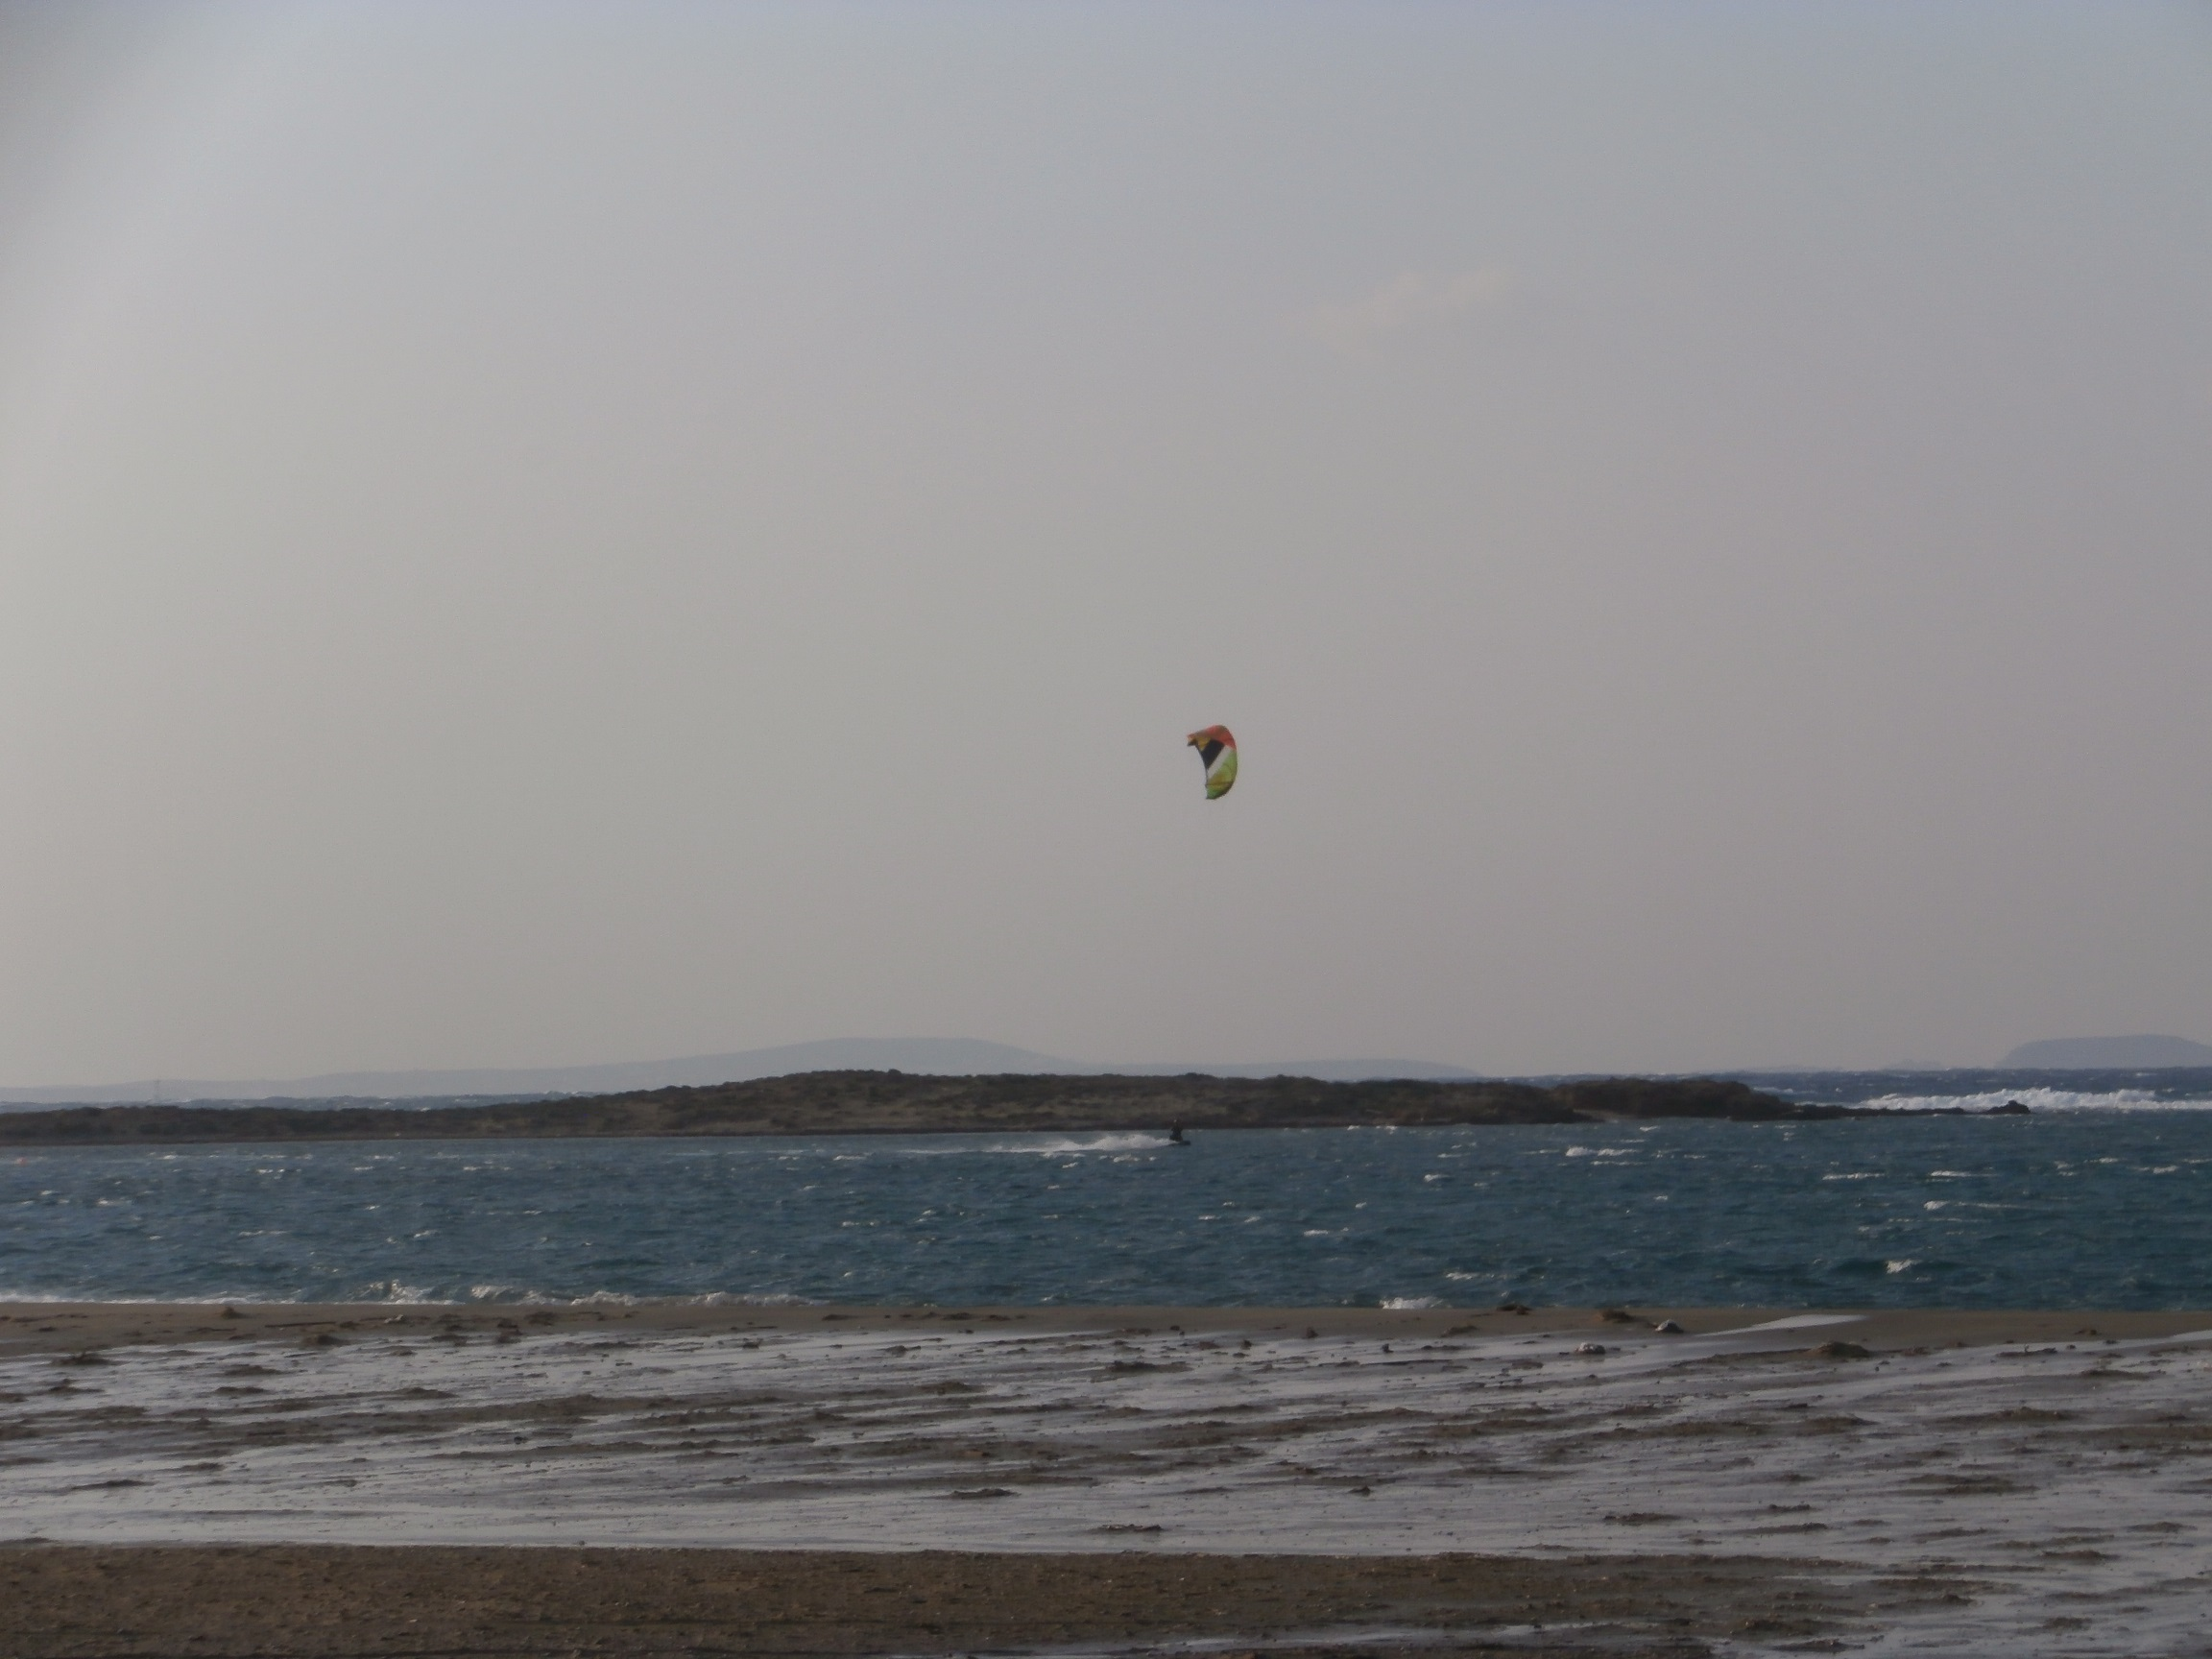 Naxos watersports